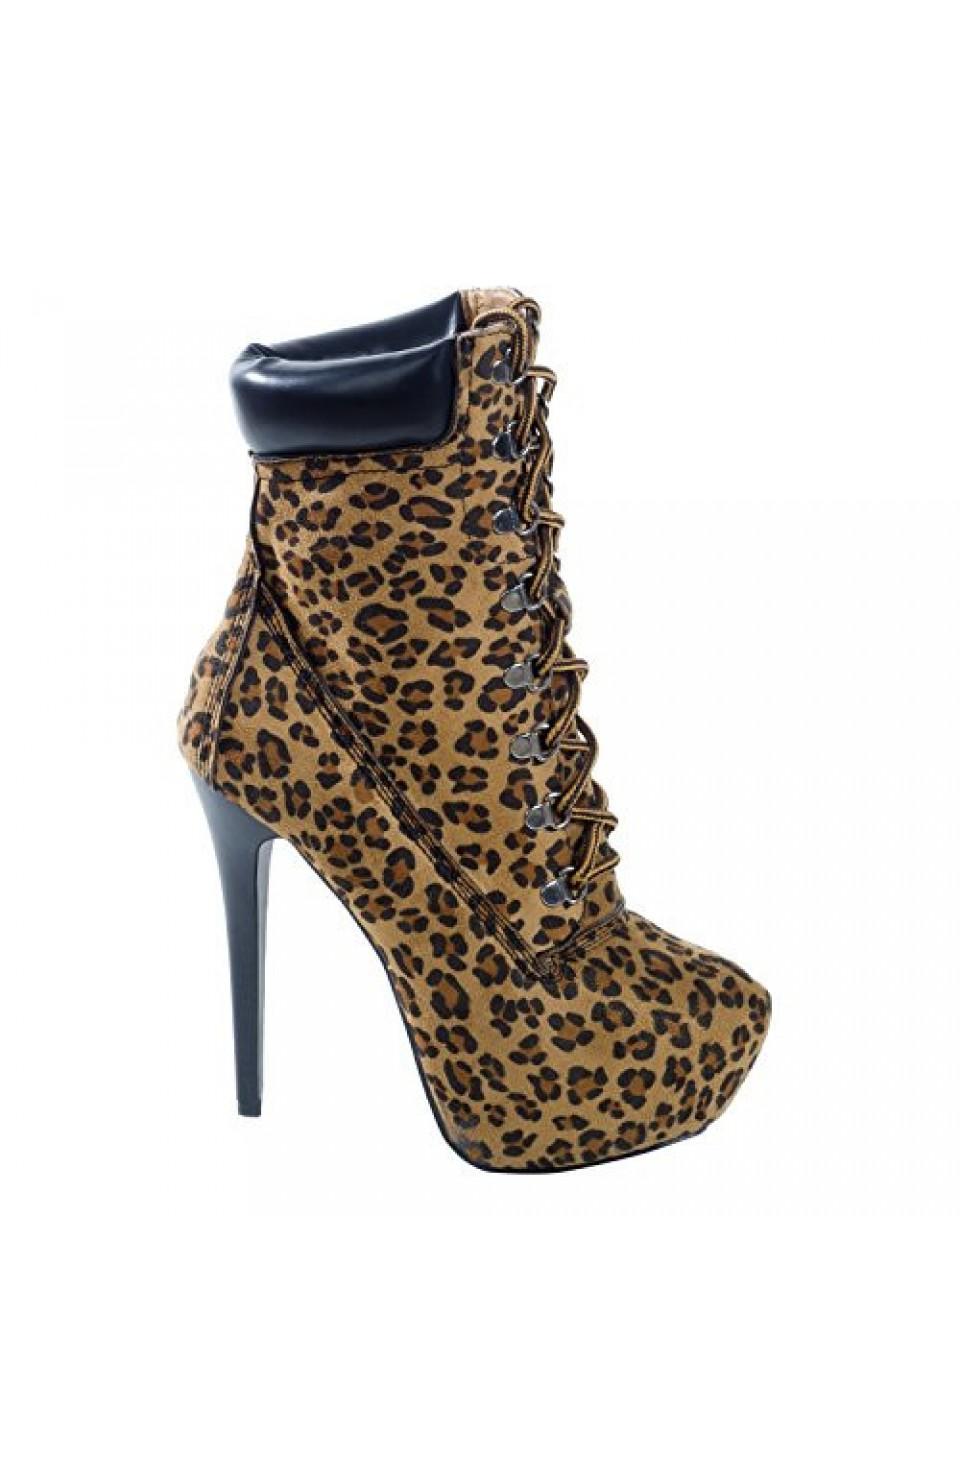 Women's Leopard Manmade Slleexi 5.5-inch Animal Print Stiletto Booties